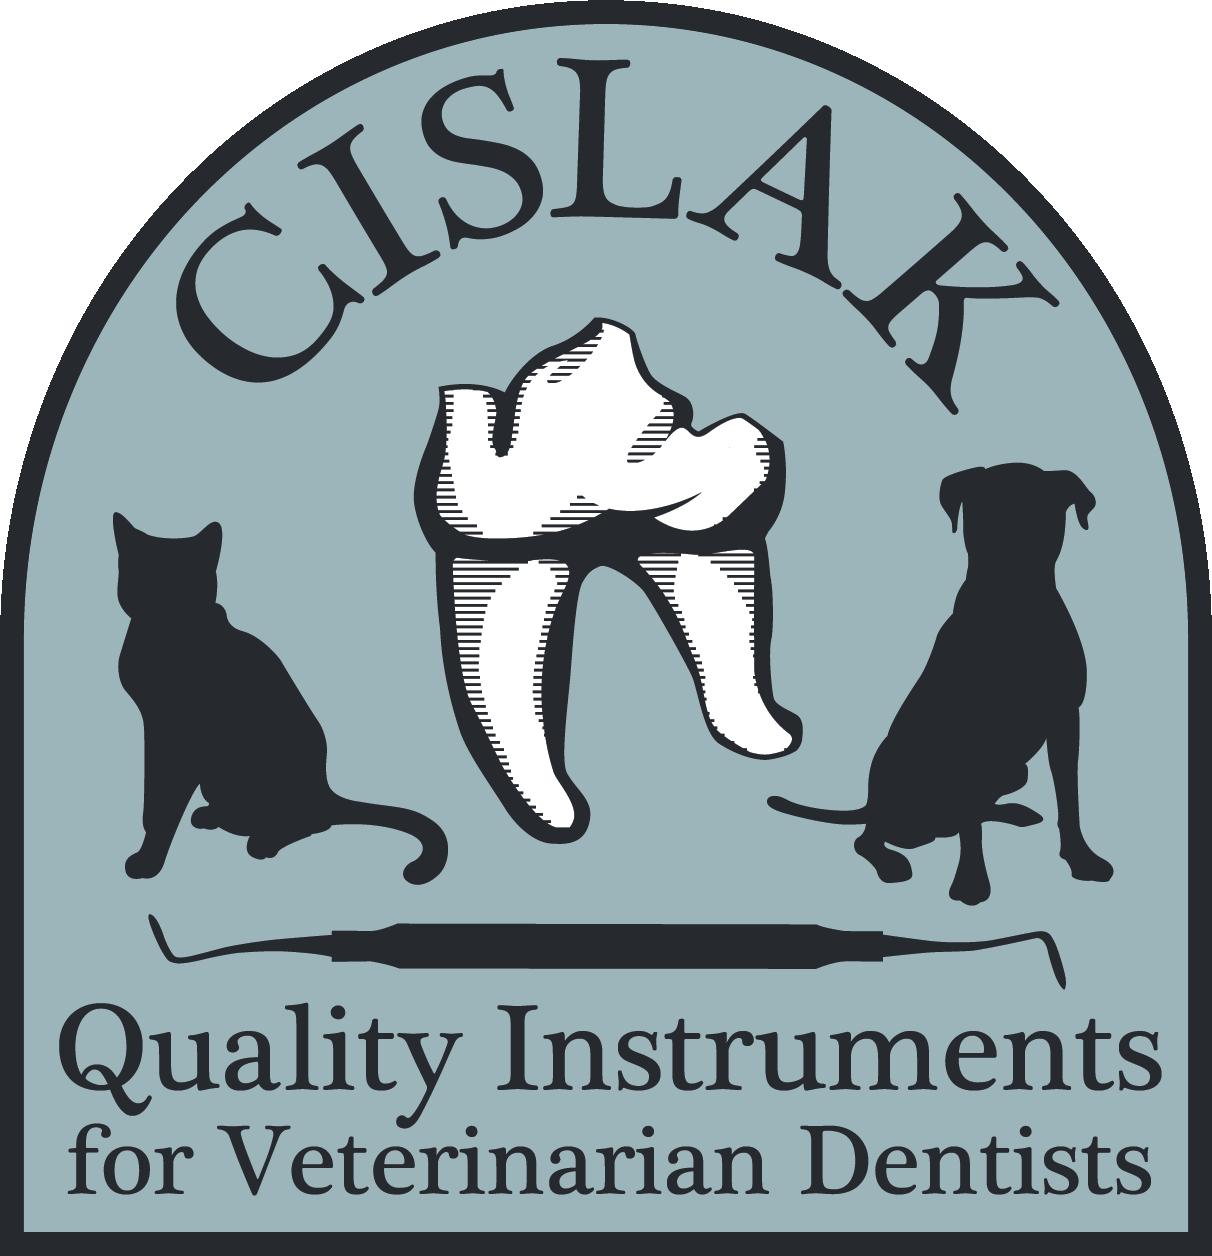 CislakMfg_logo